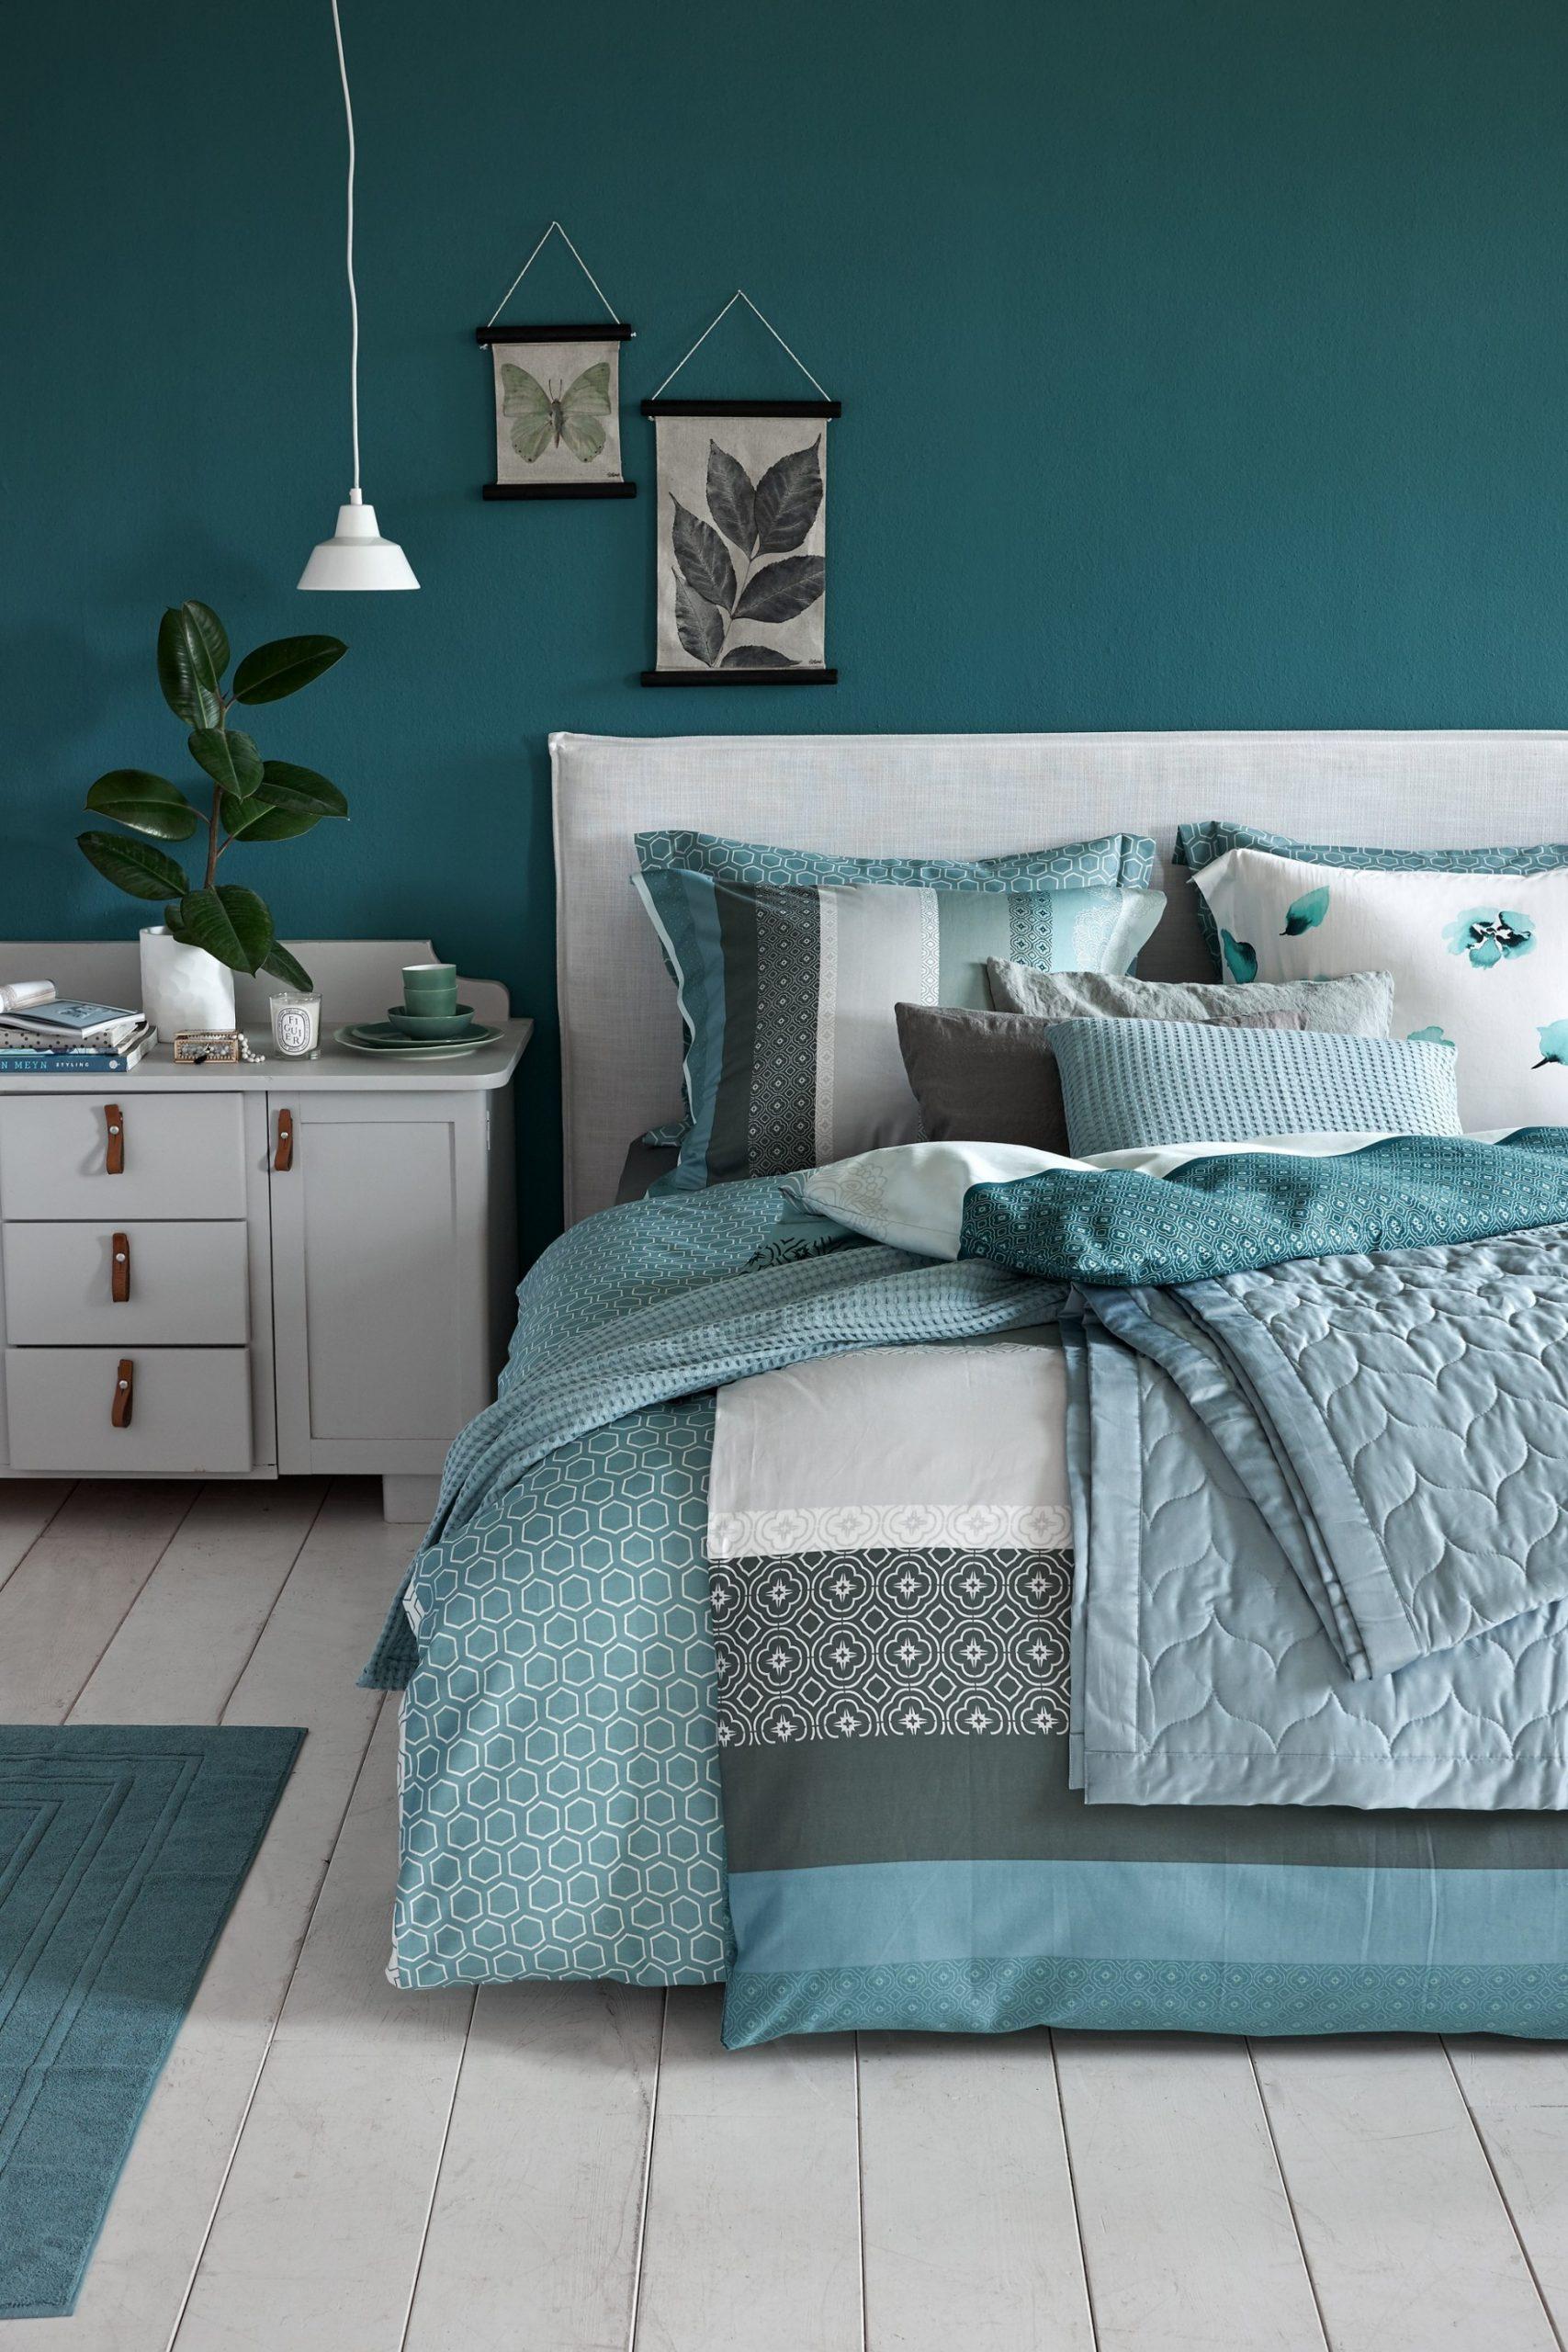 Make Room for Greenery - Teal Bedroom Ideas - Teal Room Décor - Bedroom Ideas Teal